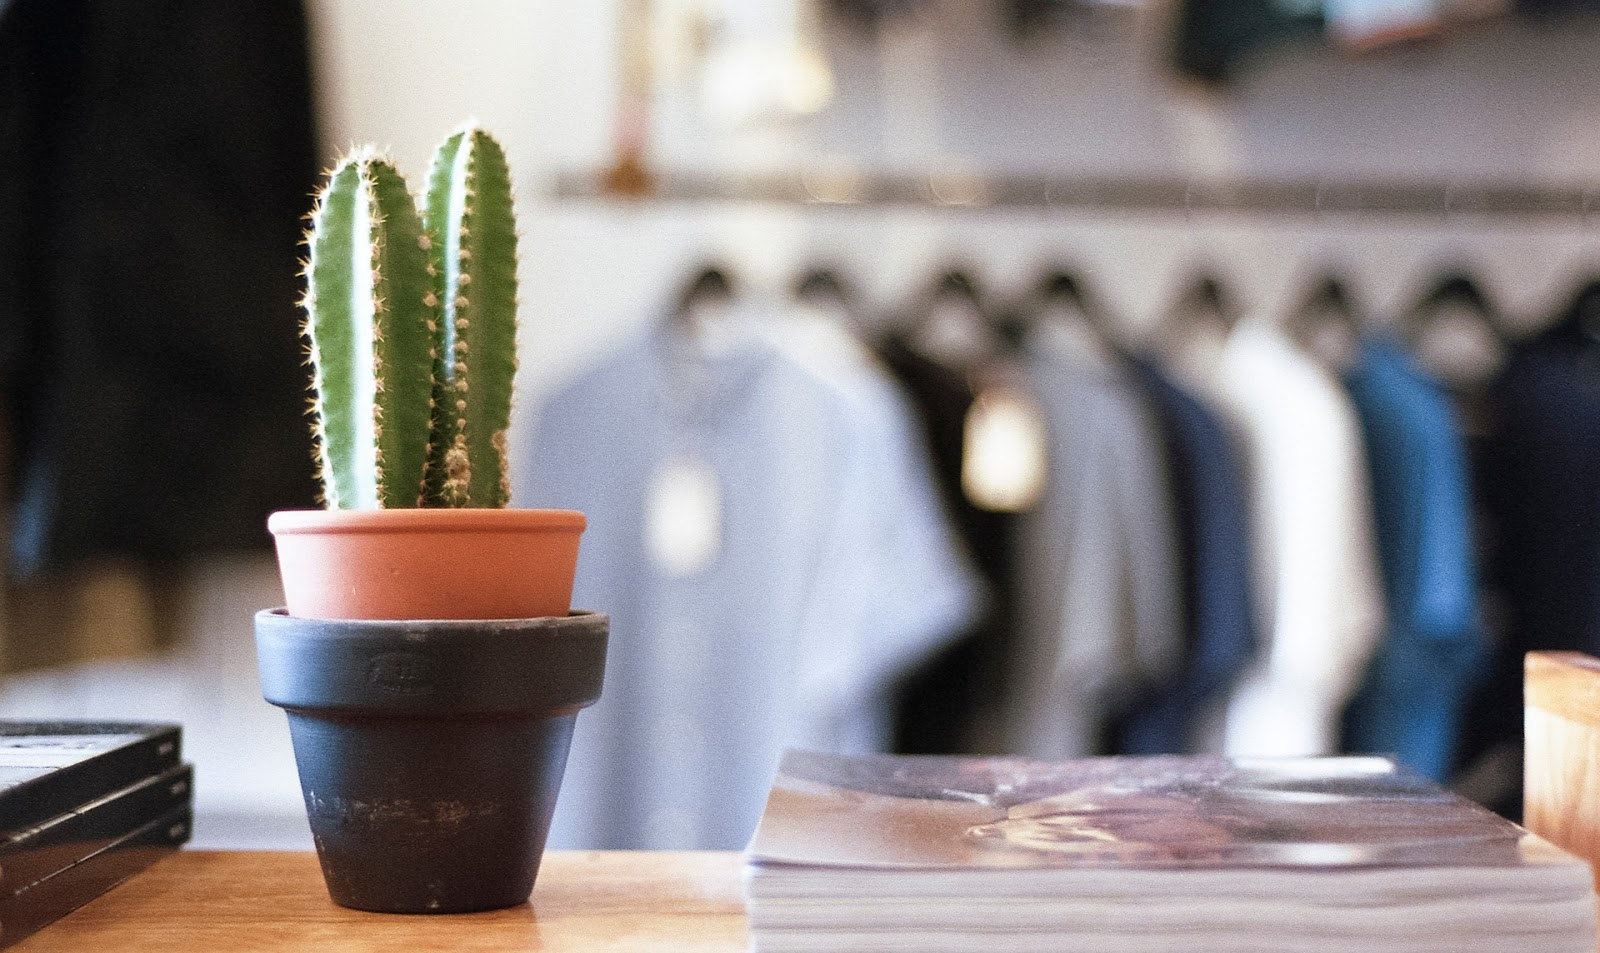 Cactus in pot on desk